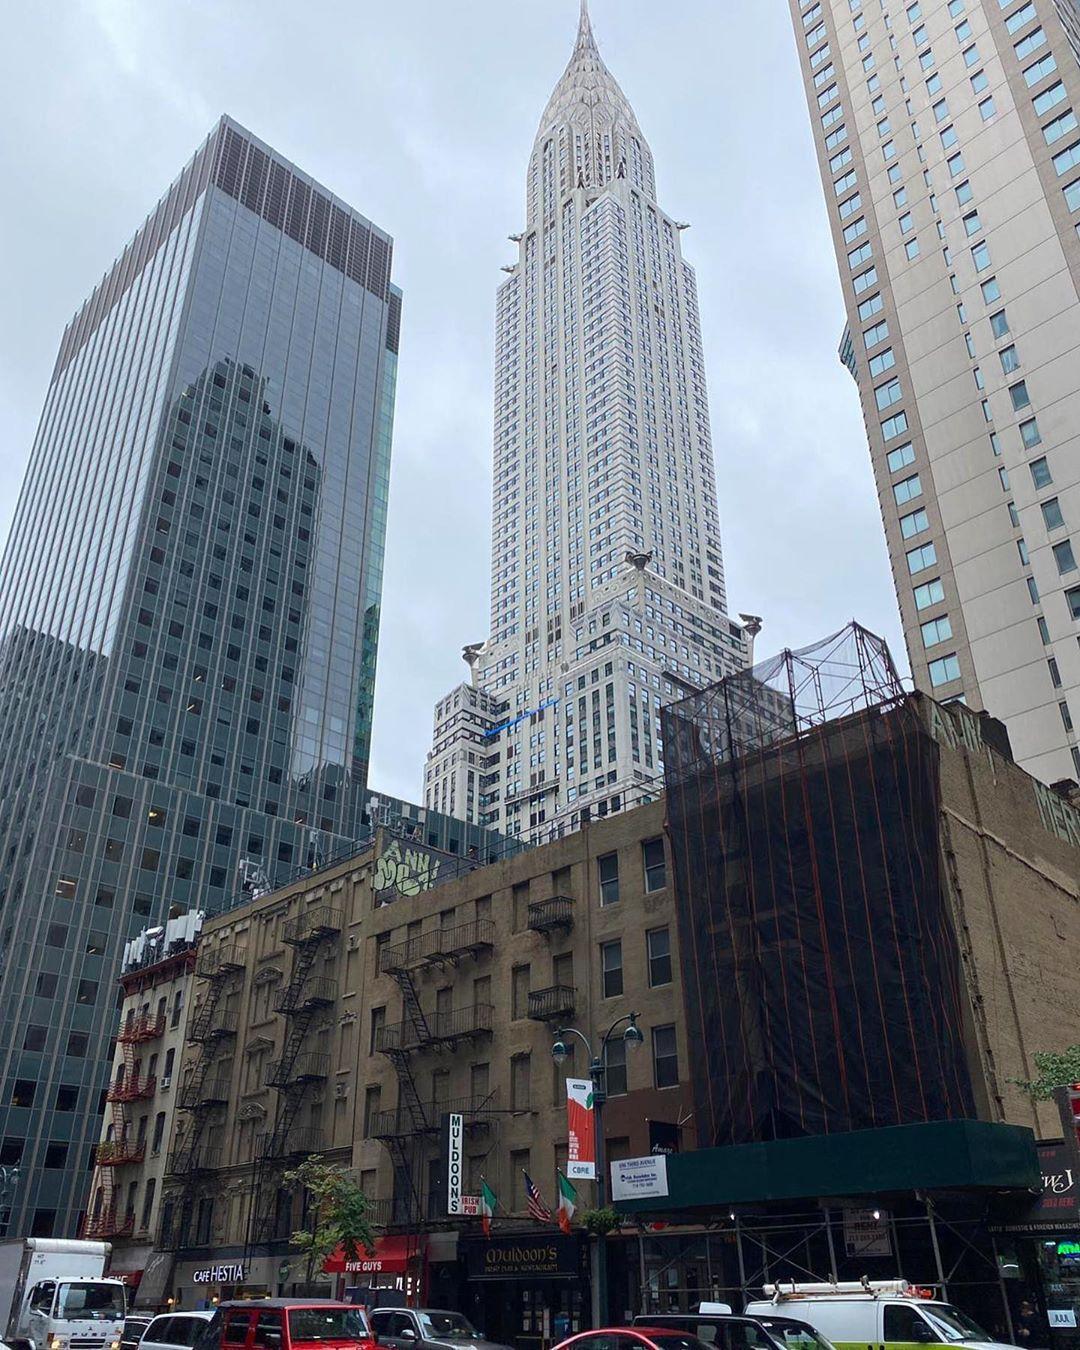 🇫🇷Le Chrysler Building ! Ciel gris sur New York aujourd'hui. 🇺🇸The Chrysler Building ! Grey sky over New York City today. 📸Photo Gaël ➡️www.cnewyork.net  #newyork #newyorkcity #nyc  #photoeveryday #nycphotographer #photography #chryslerbuilding #newyorkphotography #nycphotos #nycpictures #newyorkphotography #nycblogger #nyblogger #travelnyc #travelblogger #travelblog #travel #travelblogger #travelphoto #newyorkphotos #sky #voyage #nycphotography #midtown